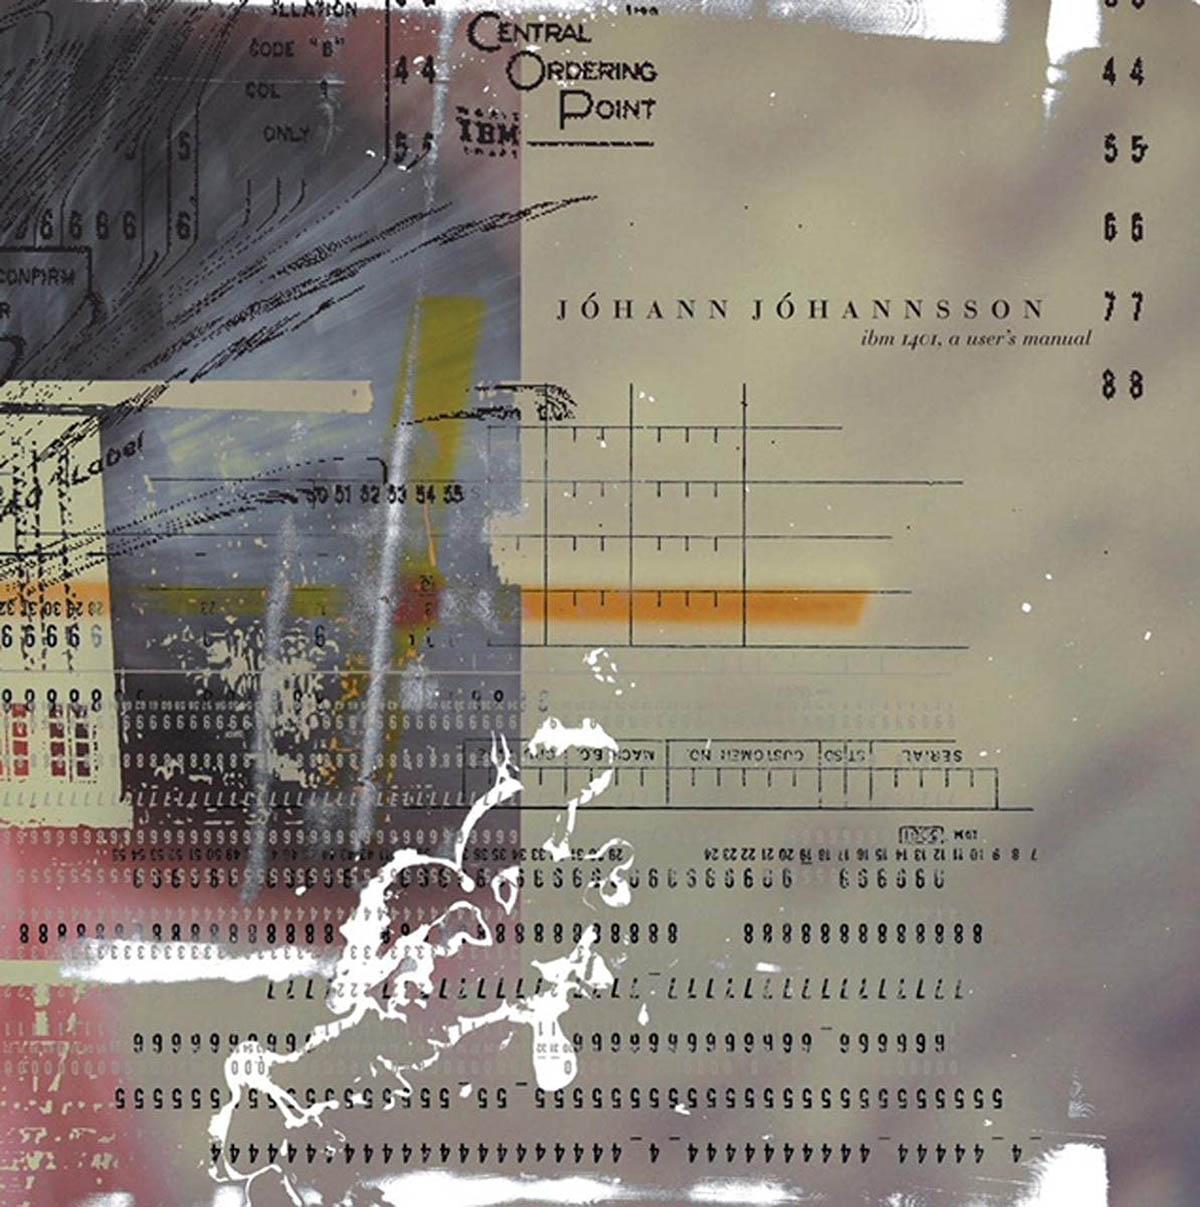 Jóhann Jóhannsson, IBM 1401 - A User's Manual